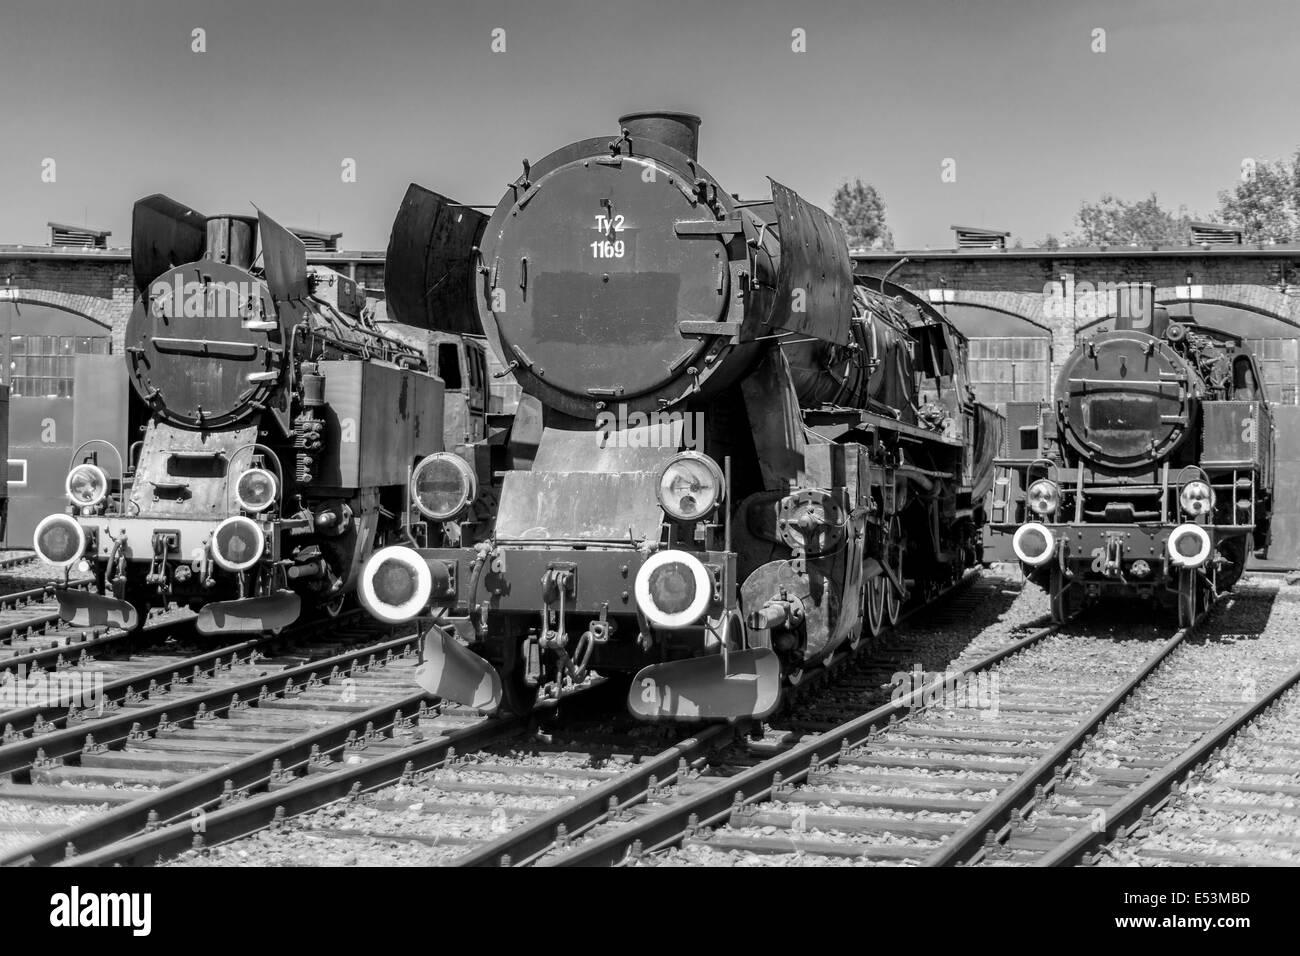 Old steam engine locomotives - Stock Image